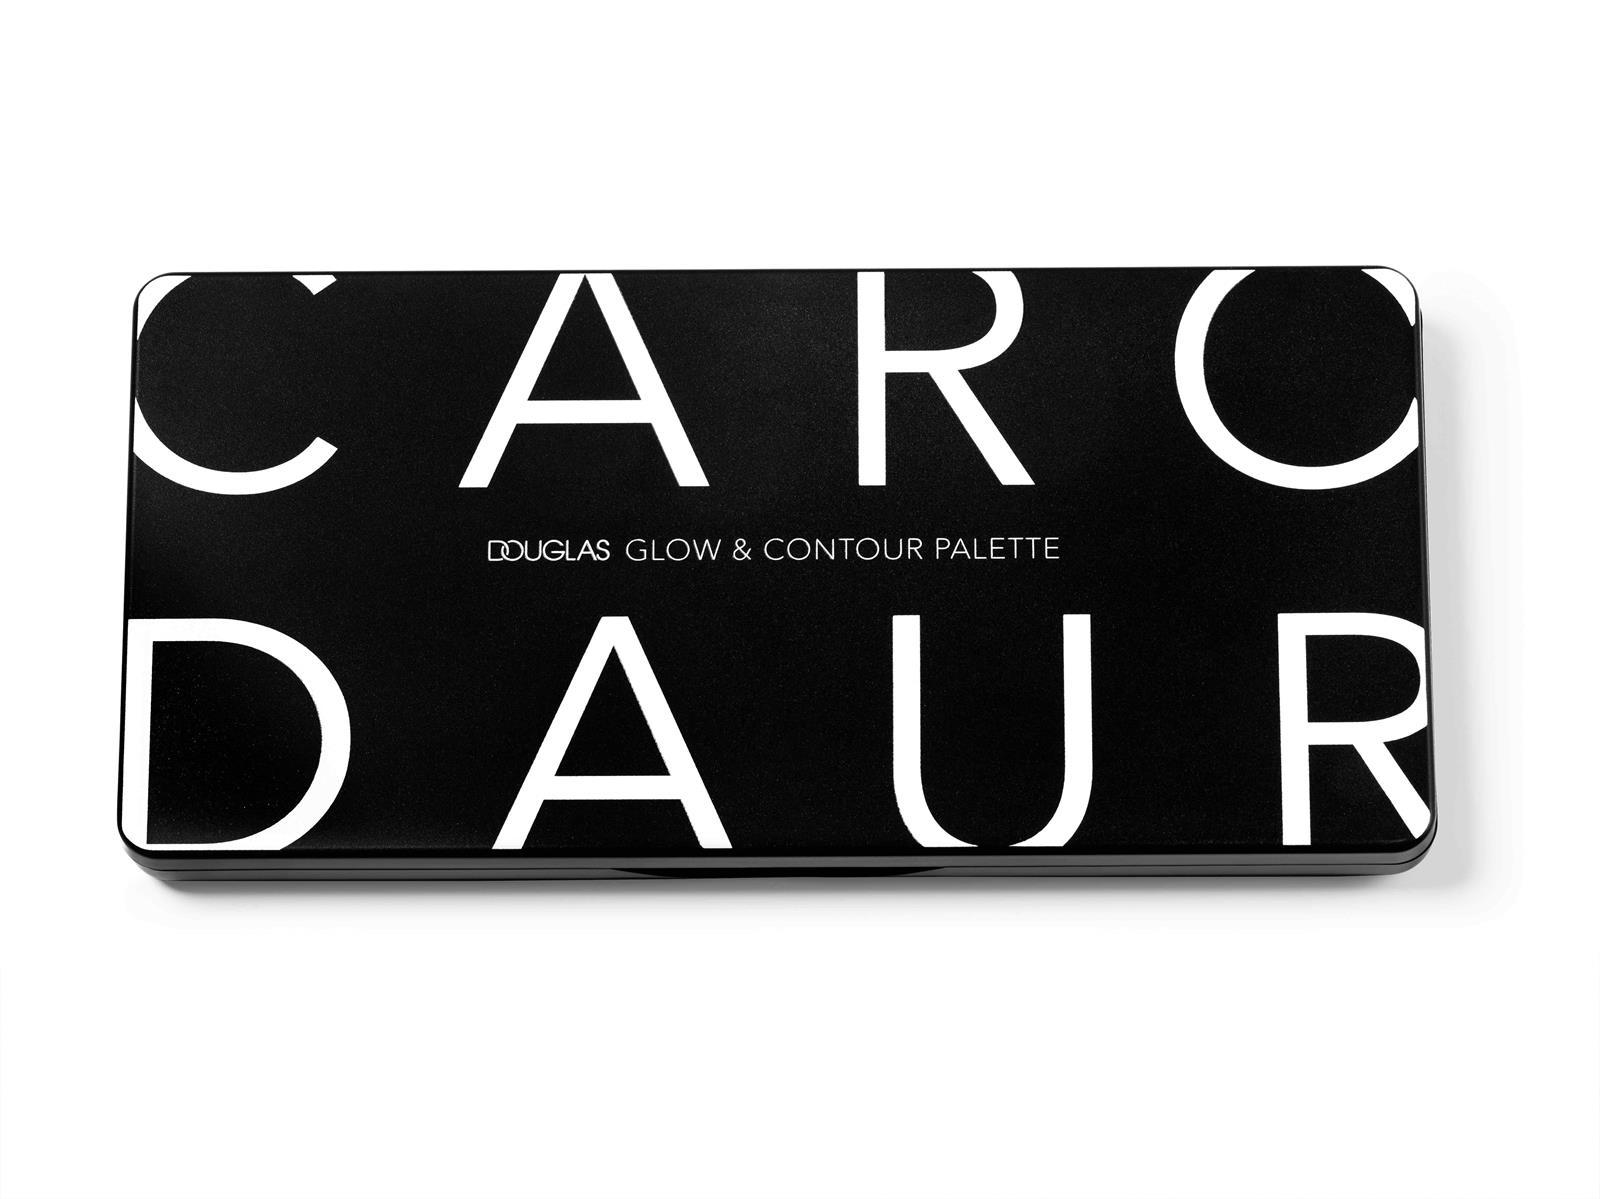 caro daur palette make-up douglas glow contour